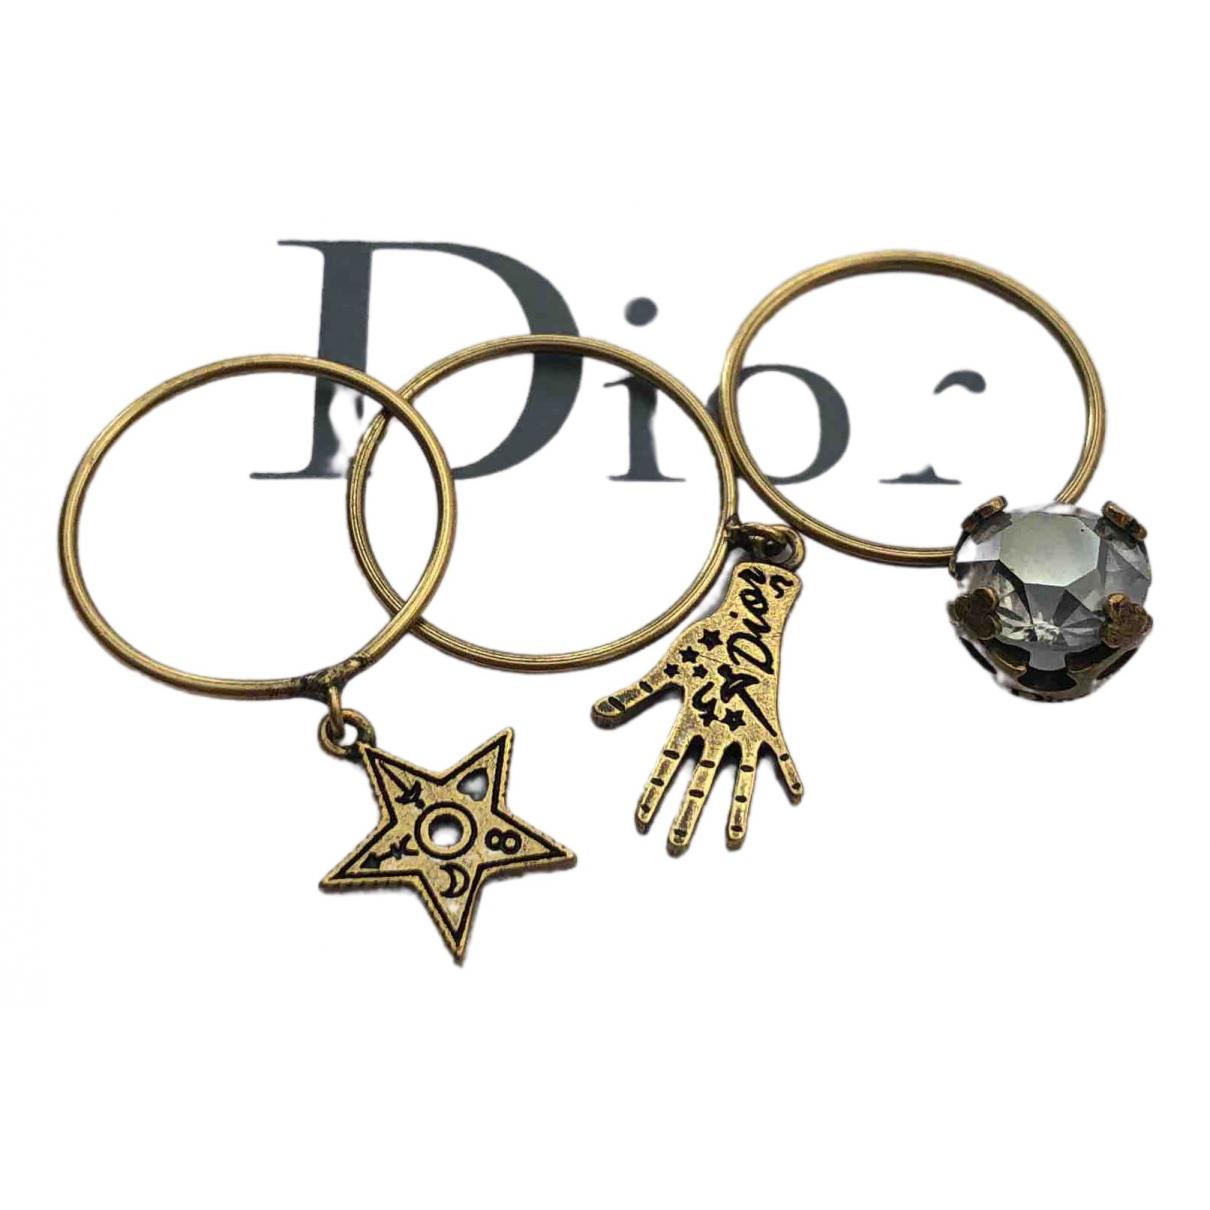 Dior - Bague Jadior pour femme en metal - marron